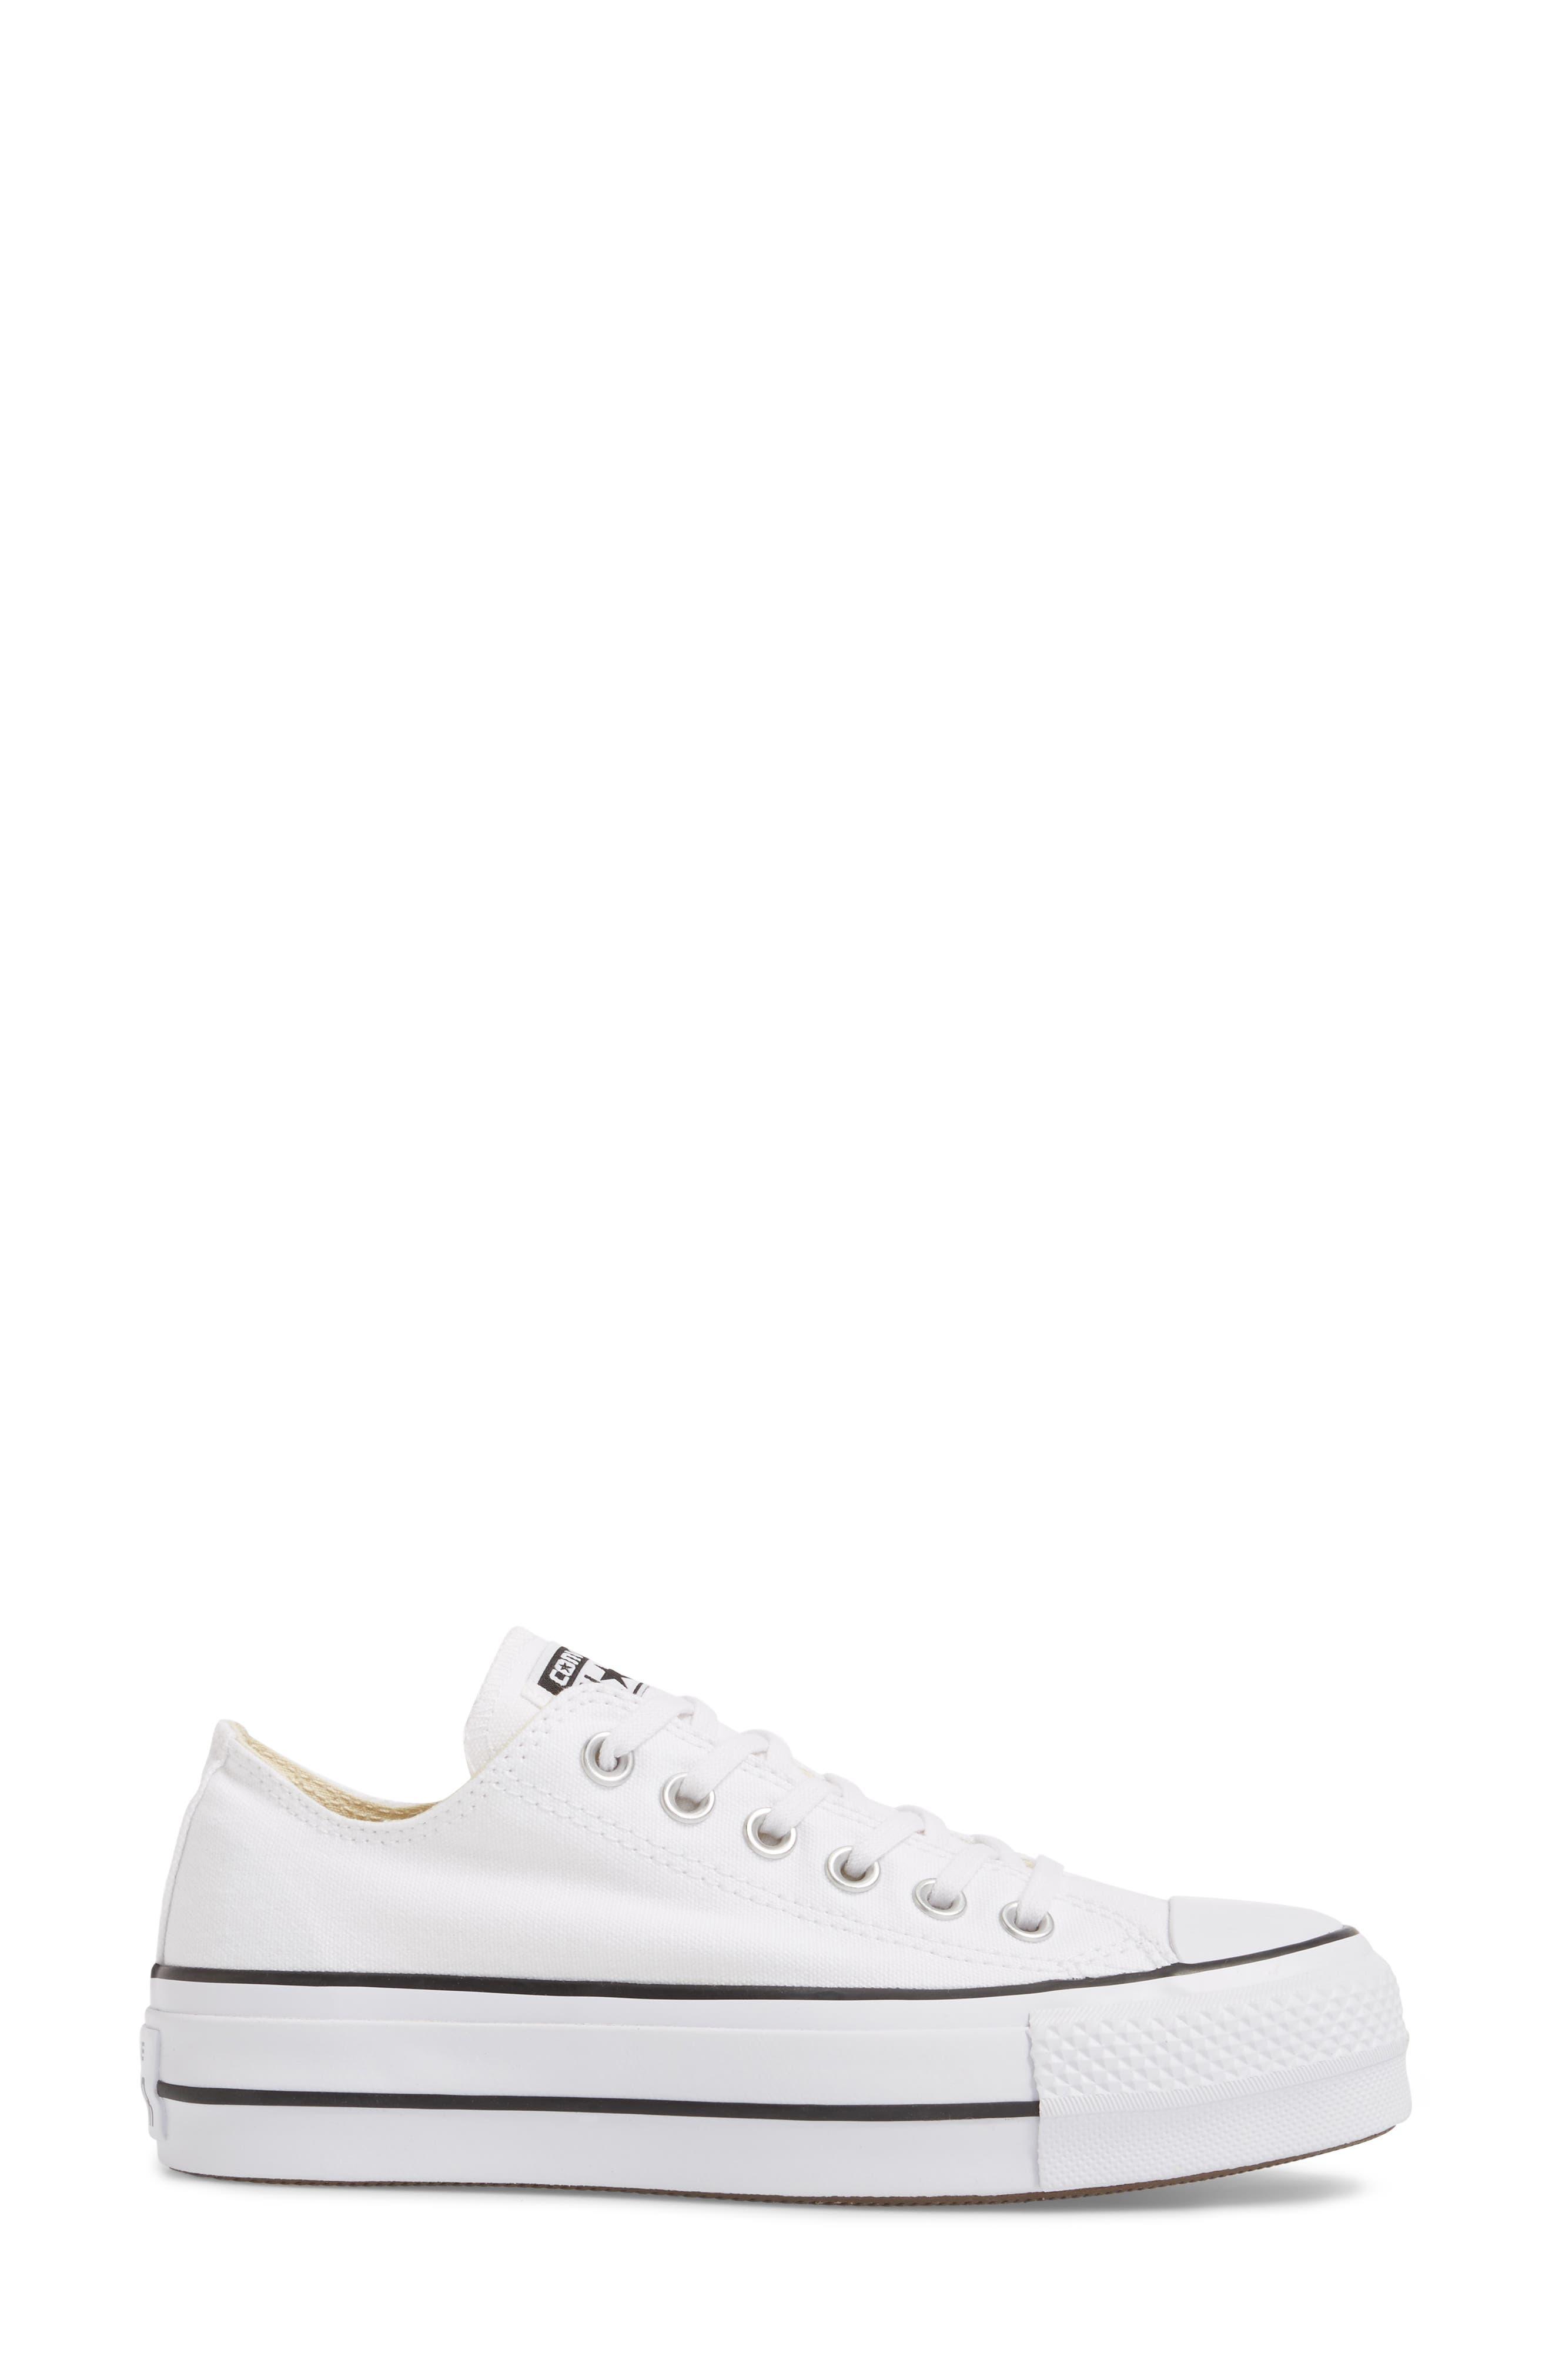 Chuck Taylor<sup>®</sup> All Star<sup>®</sup> Platform Sneaker,                             Alternate thumbnail 3, color,                             White/ Black/ White